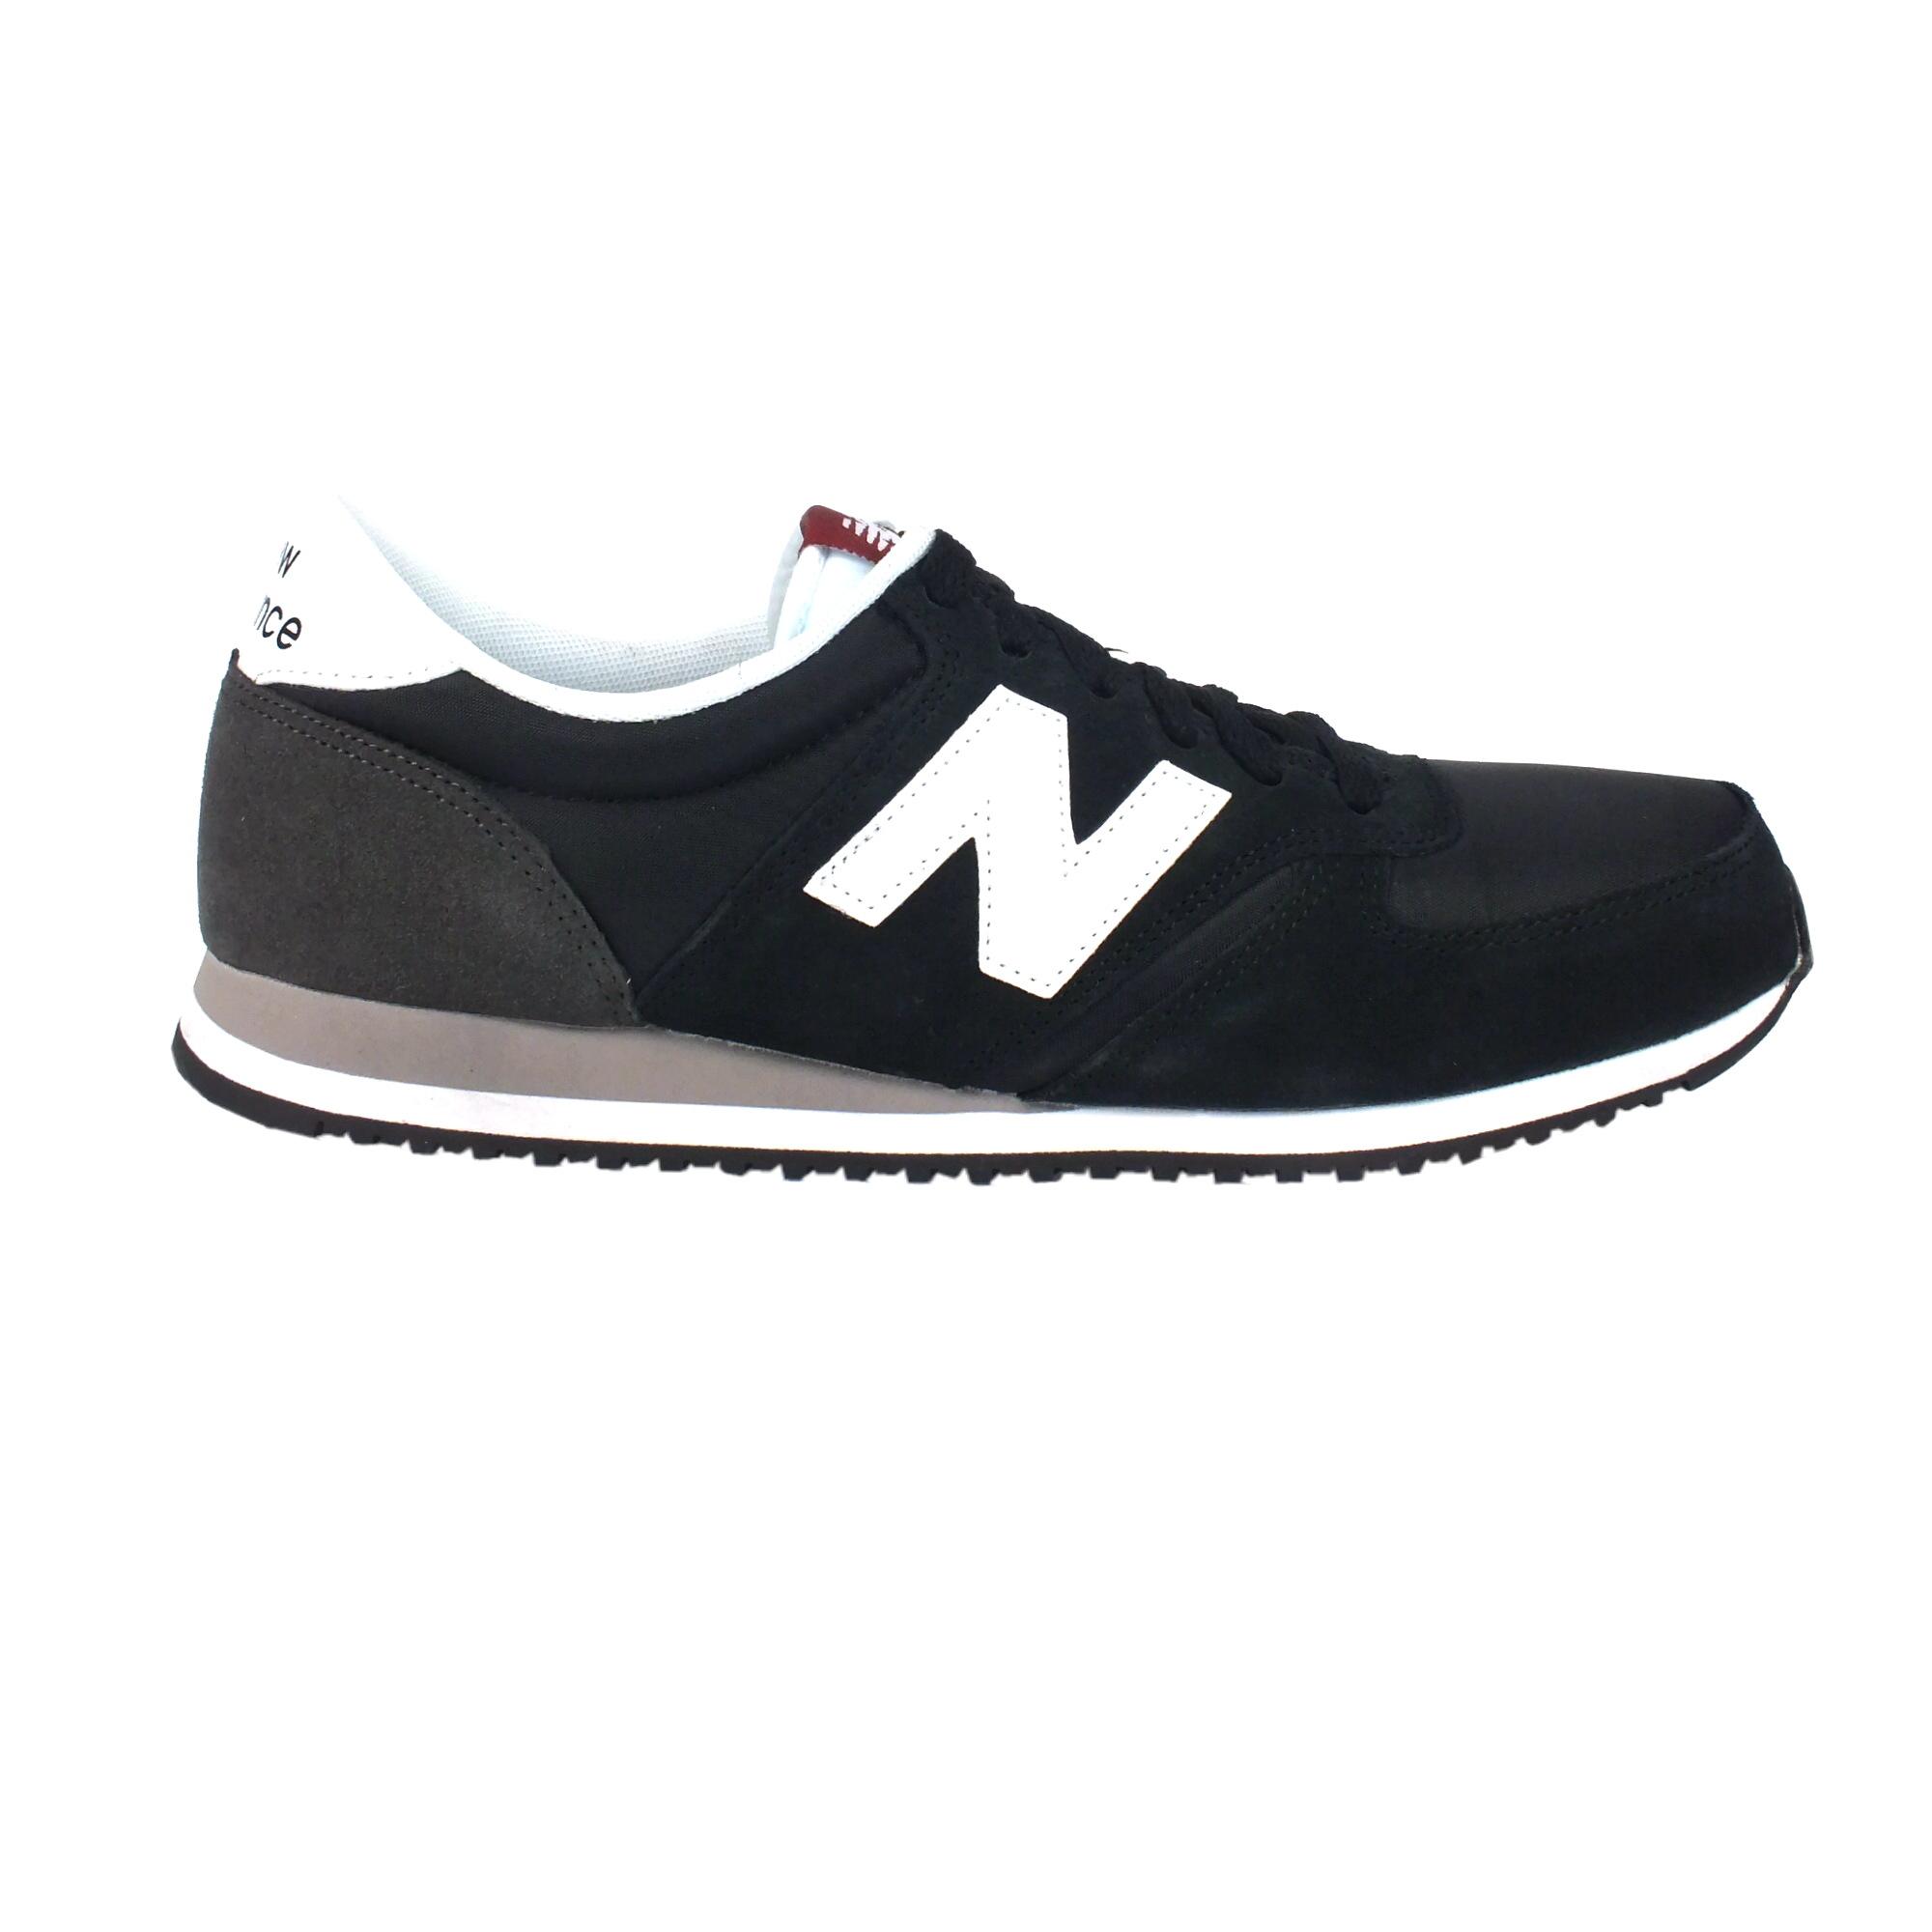 NEU New Balance U420 Herren Schuhe Unisex Sneaker Turnschuhe Gr n